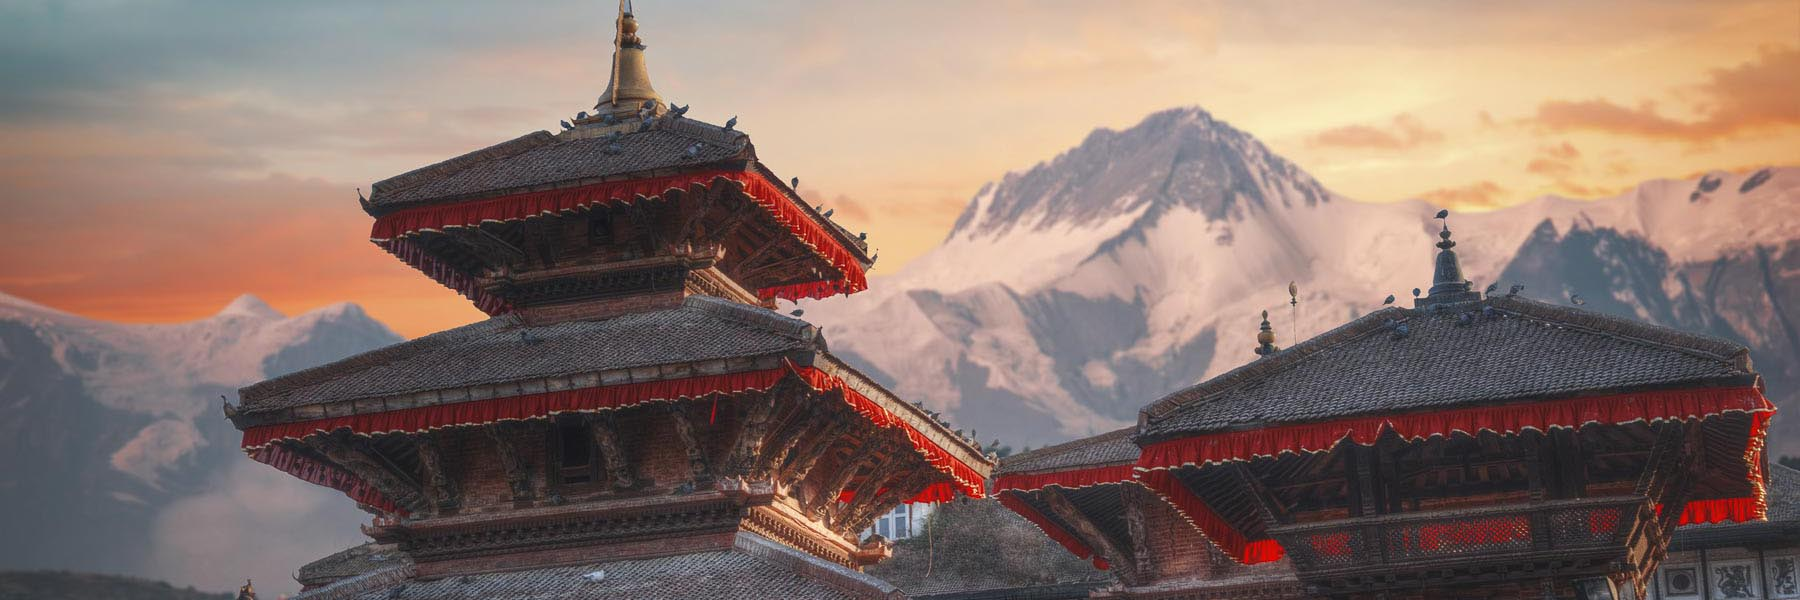 North India & Nepal